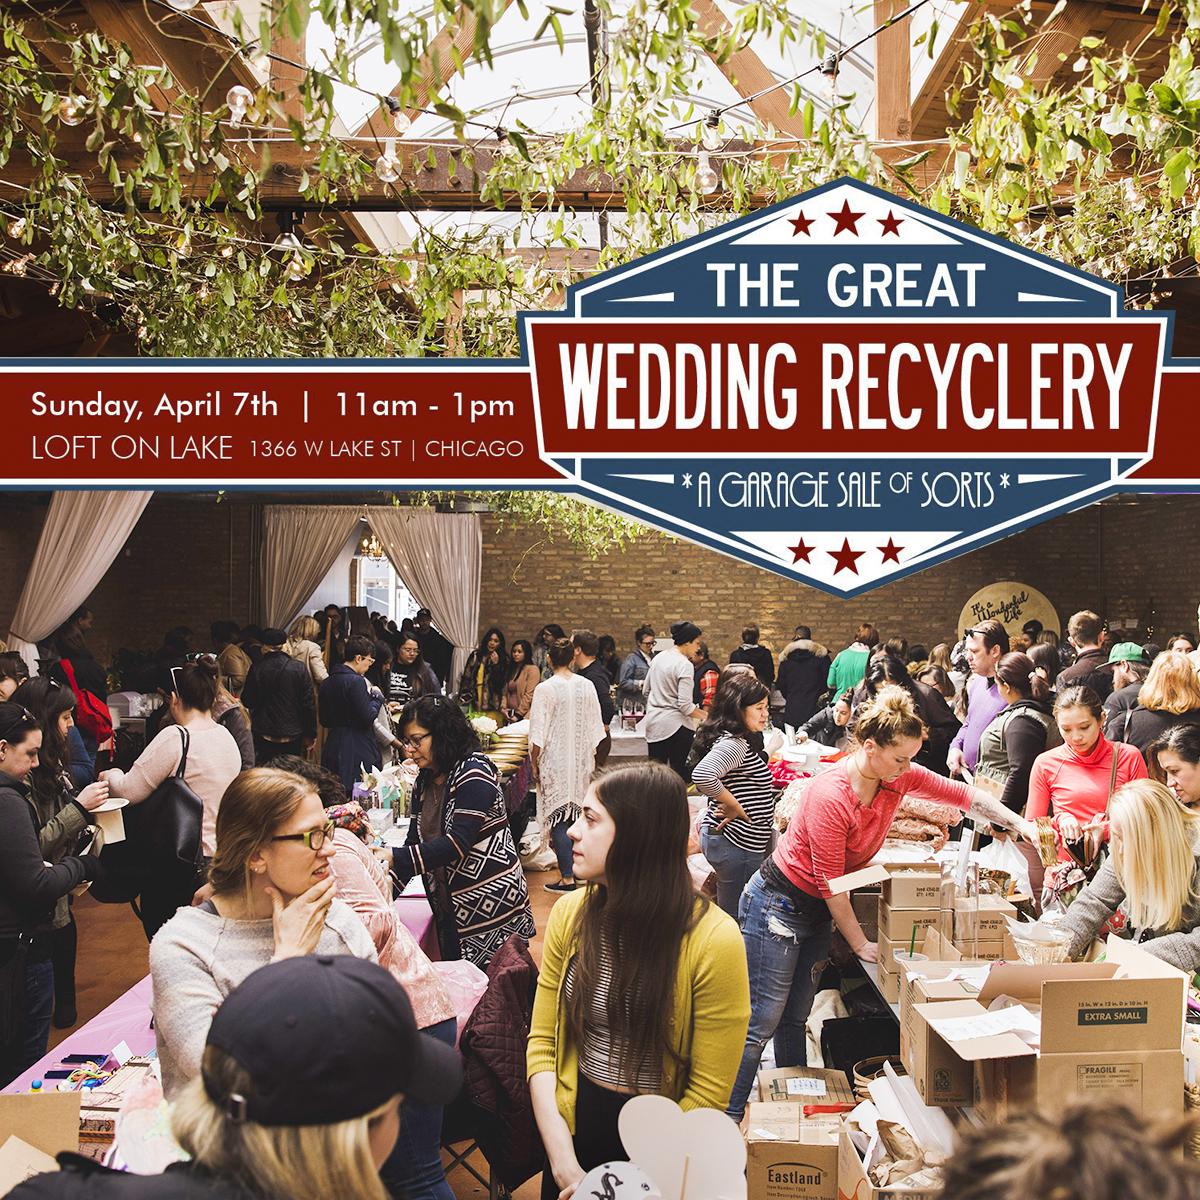 Wedding Garage Sale.Attend The Great Wedding Recyclery The Annual Wedding Garage Sale